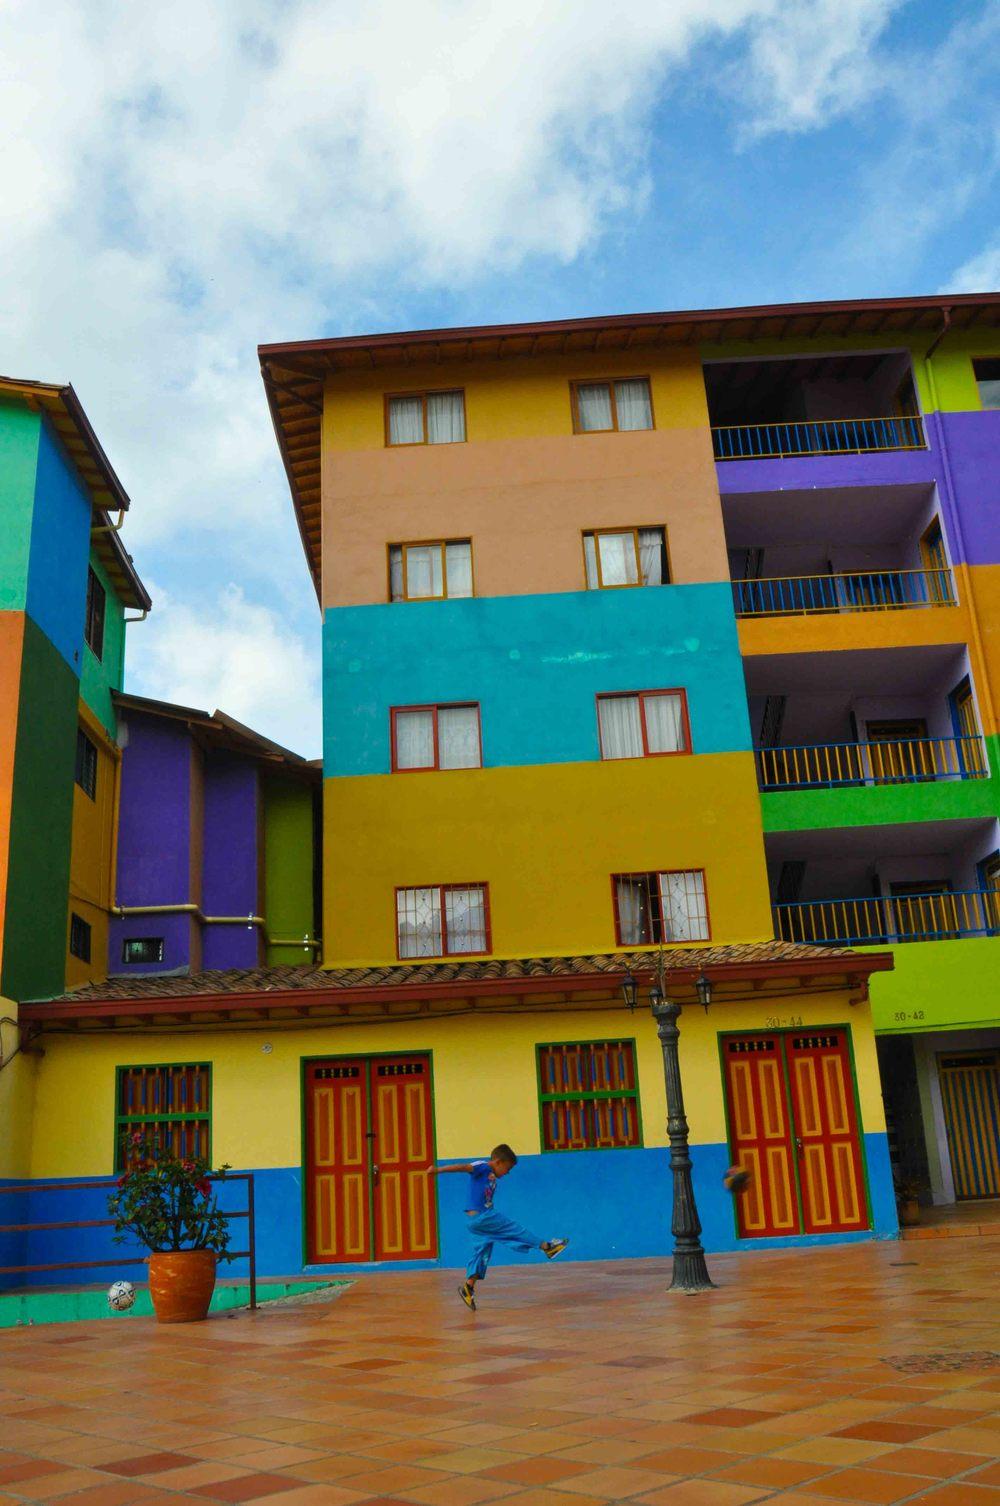 2015_10_Medellin-17.jpg